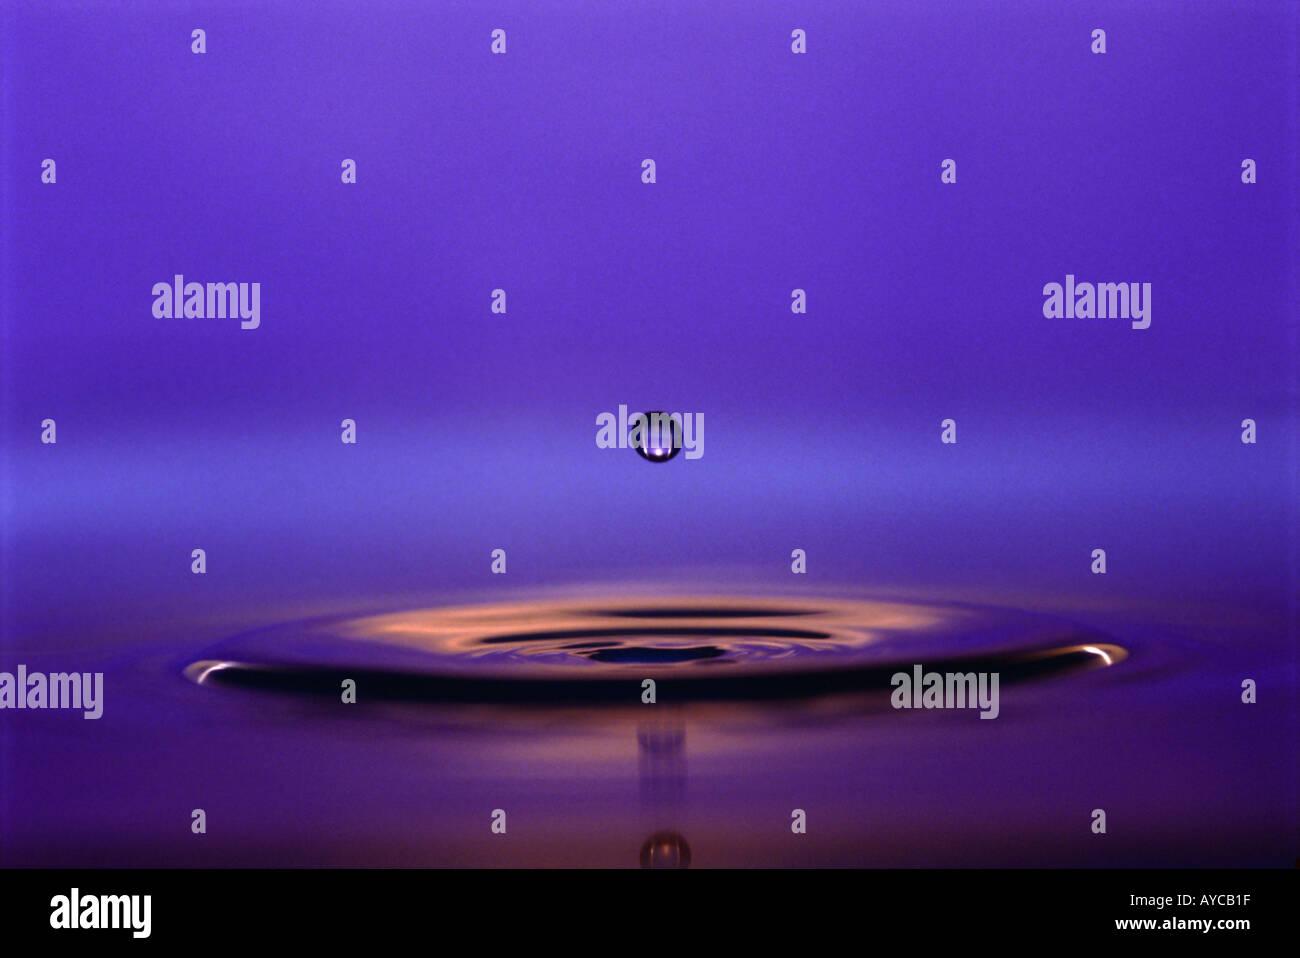 drop of water - Stock Image